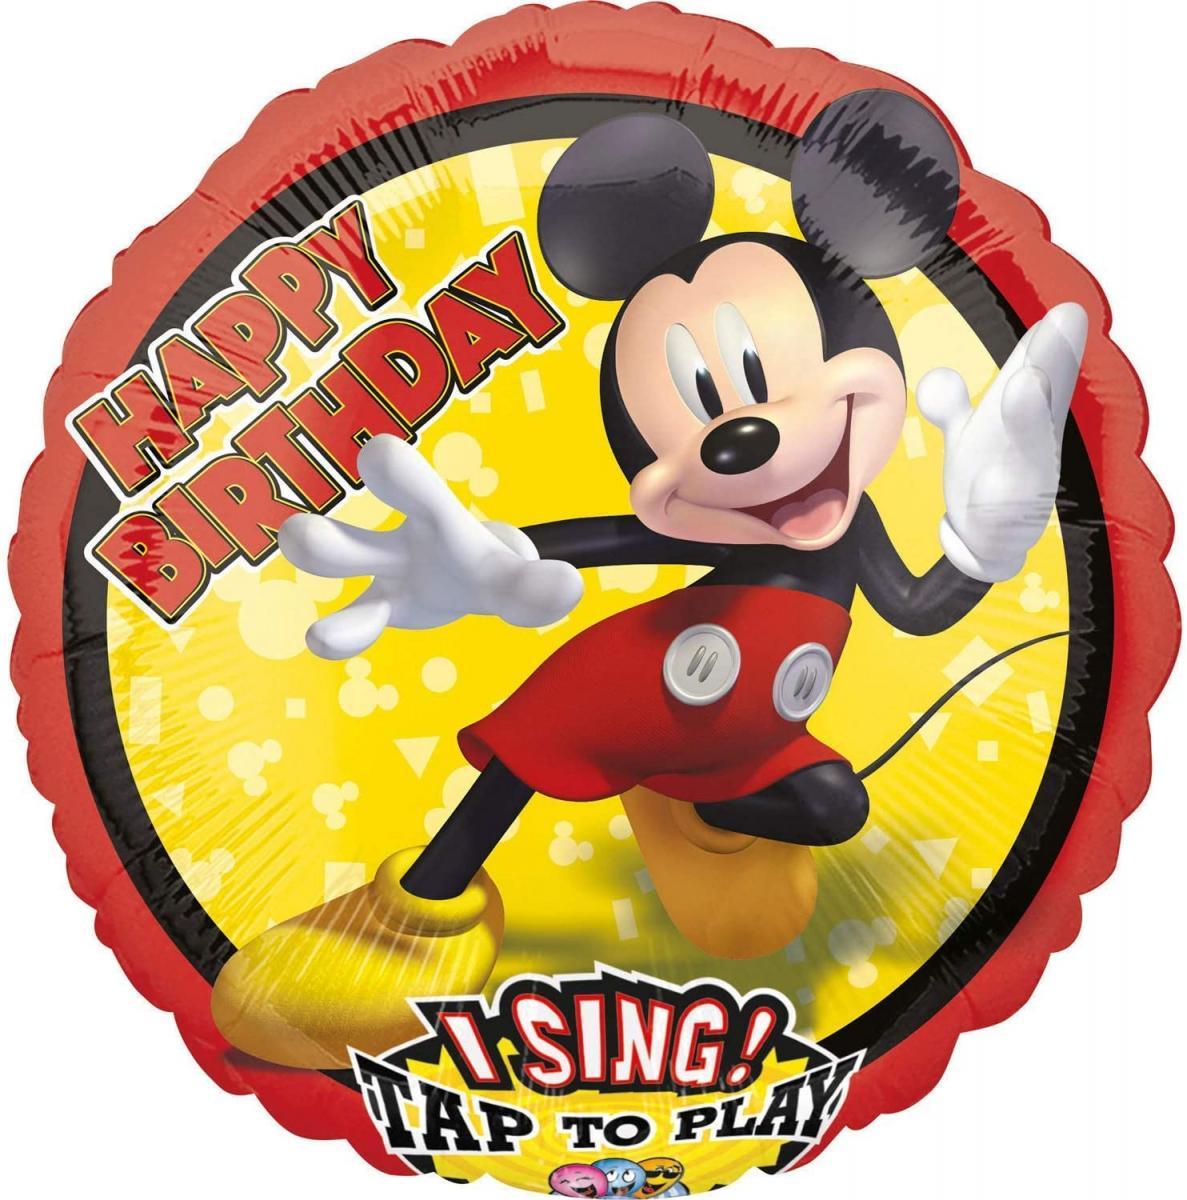 Singender Folienballon Micky Maus